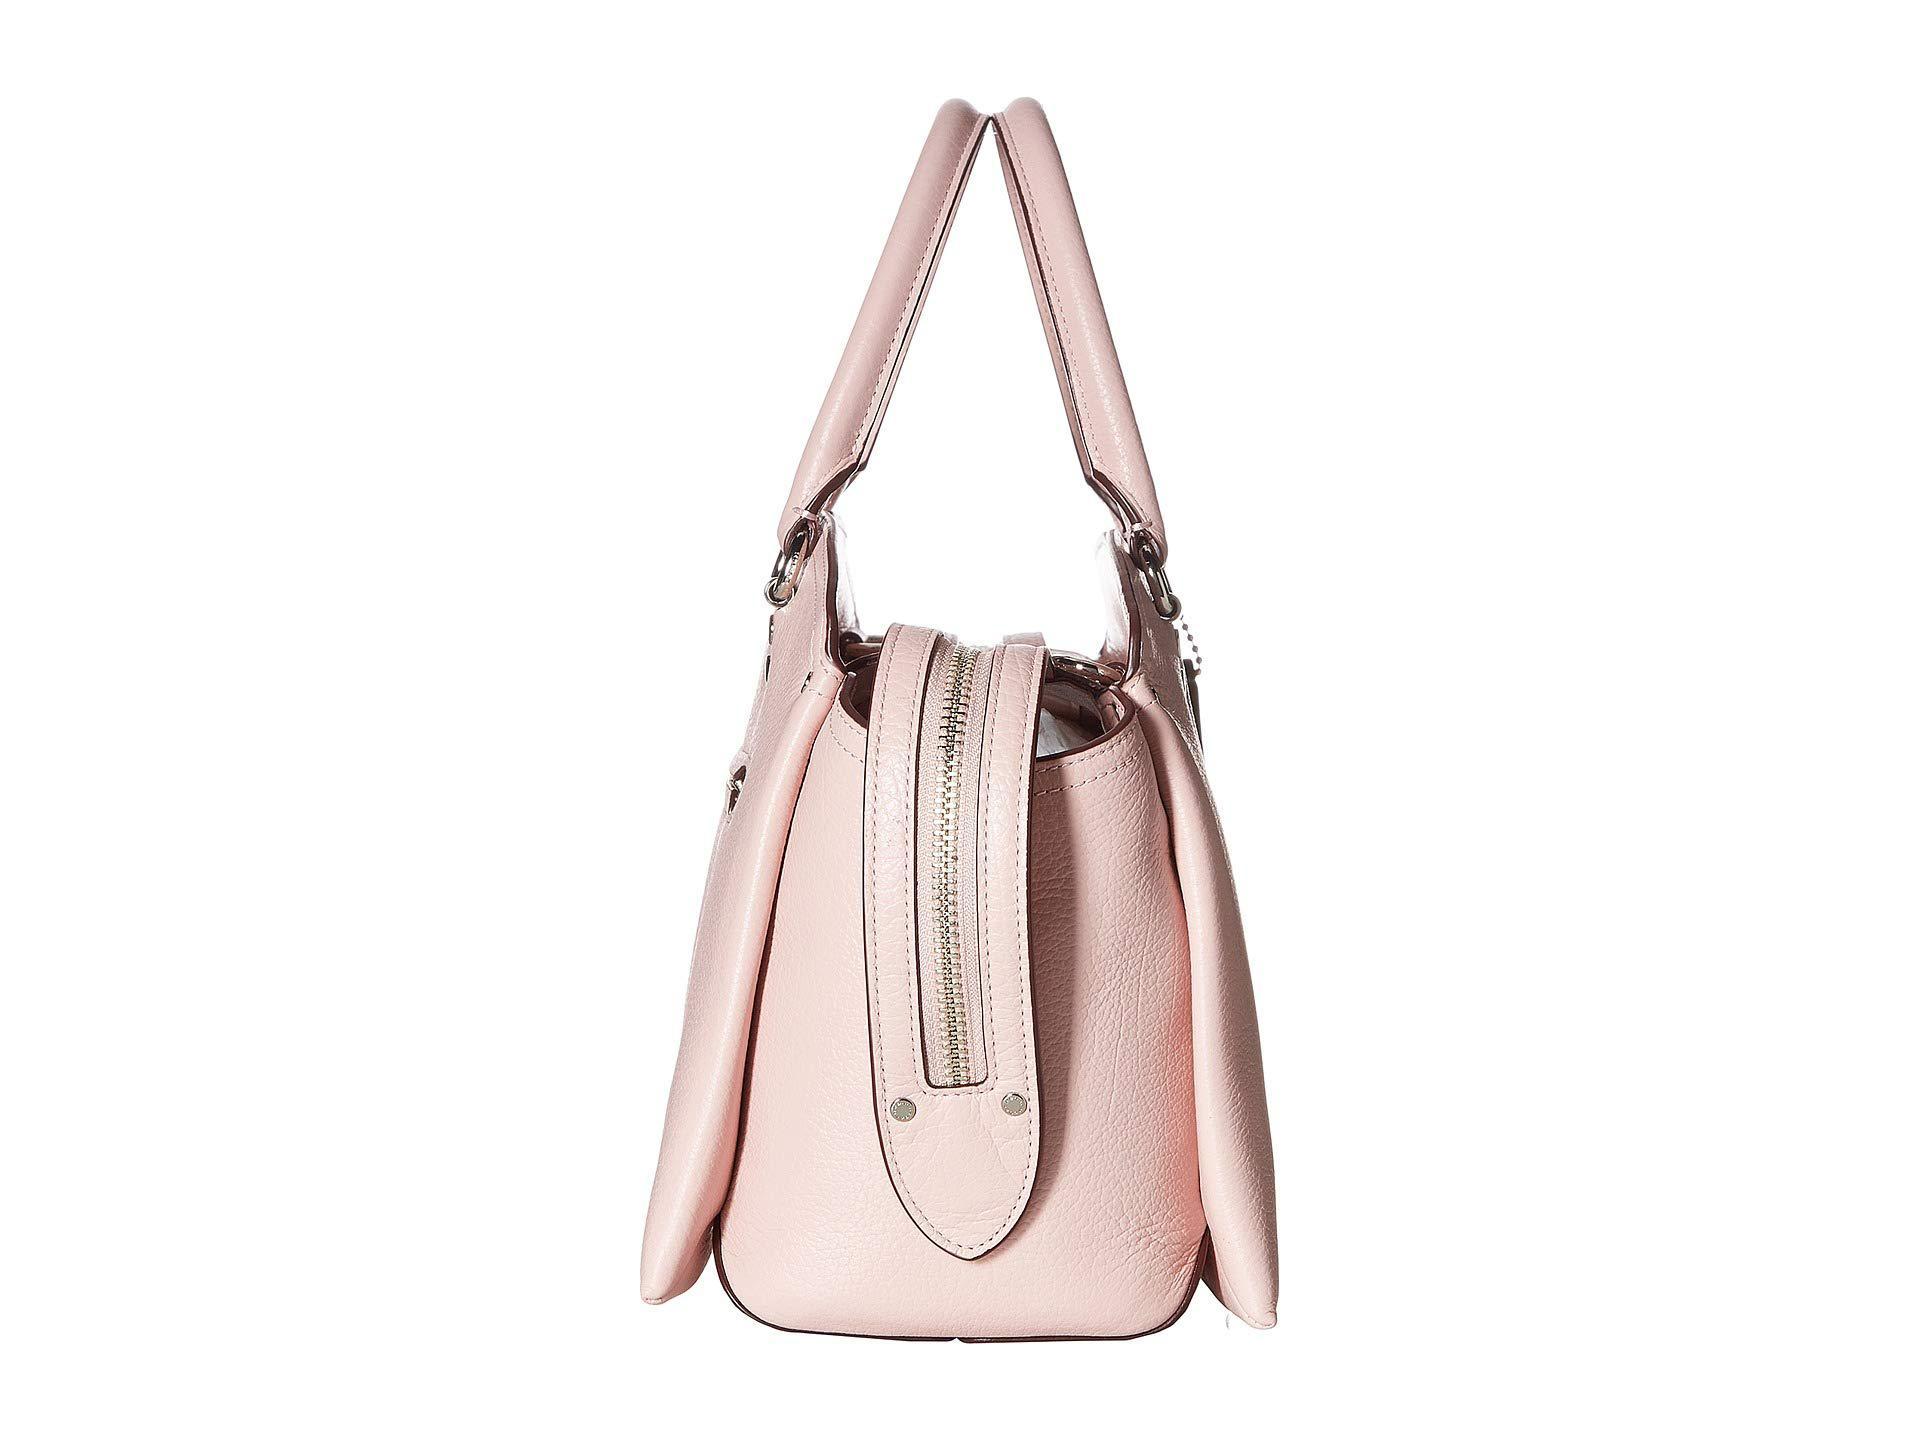 2b2ad66e4228 Lyst - COACH Drew Satchel (beechwood gold) Satchel Handbags in Pink